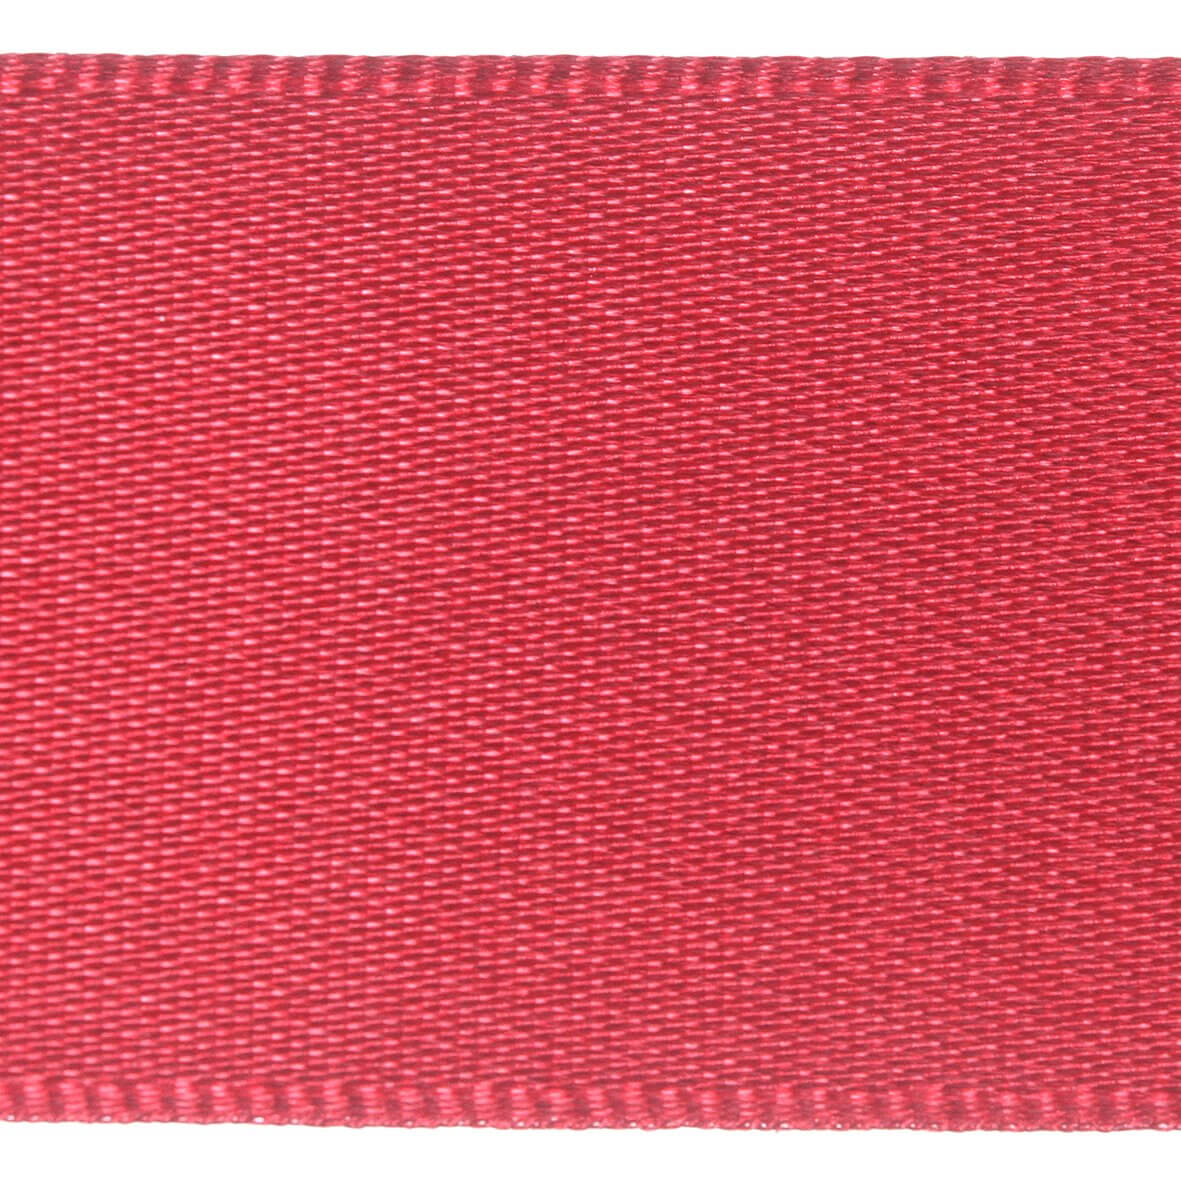 10mm Berisfords Satin Ribbon - Scarlet Berry Colour 908